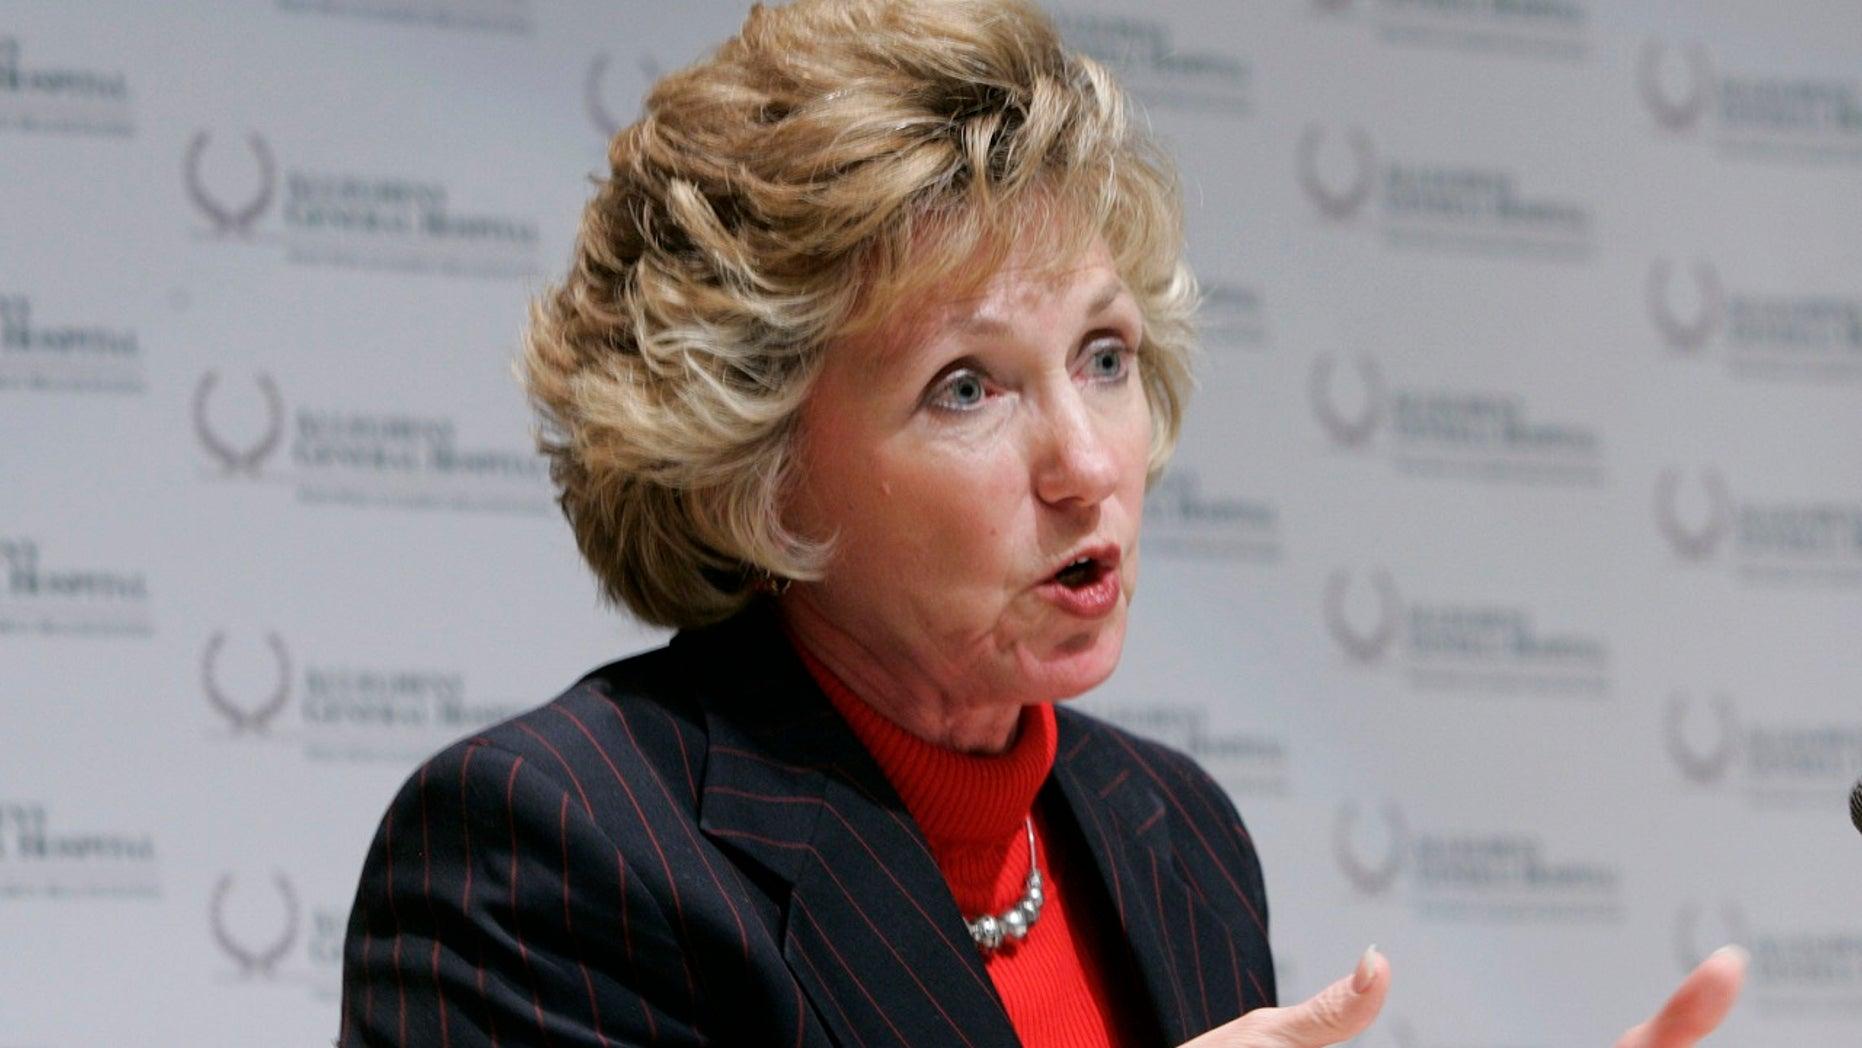 West Virginia governor fires education secretary, wife of US Sen Joe